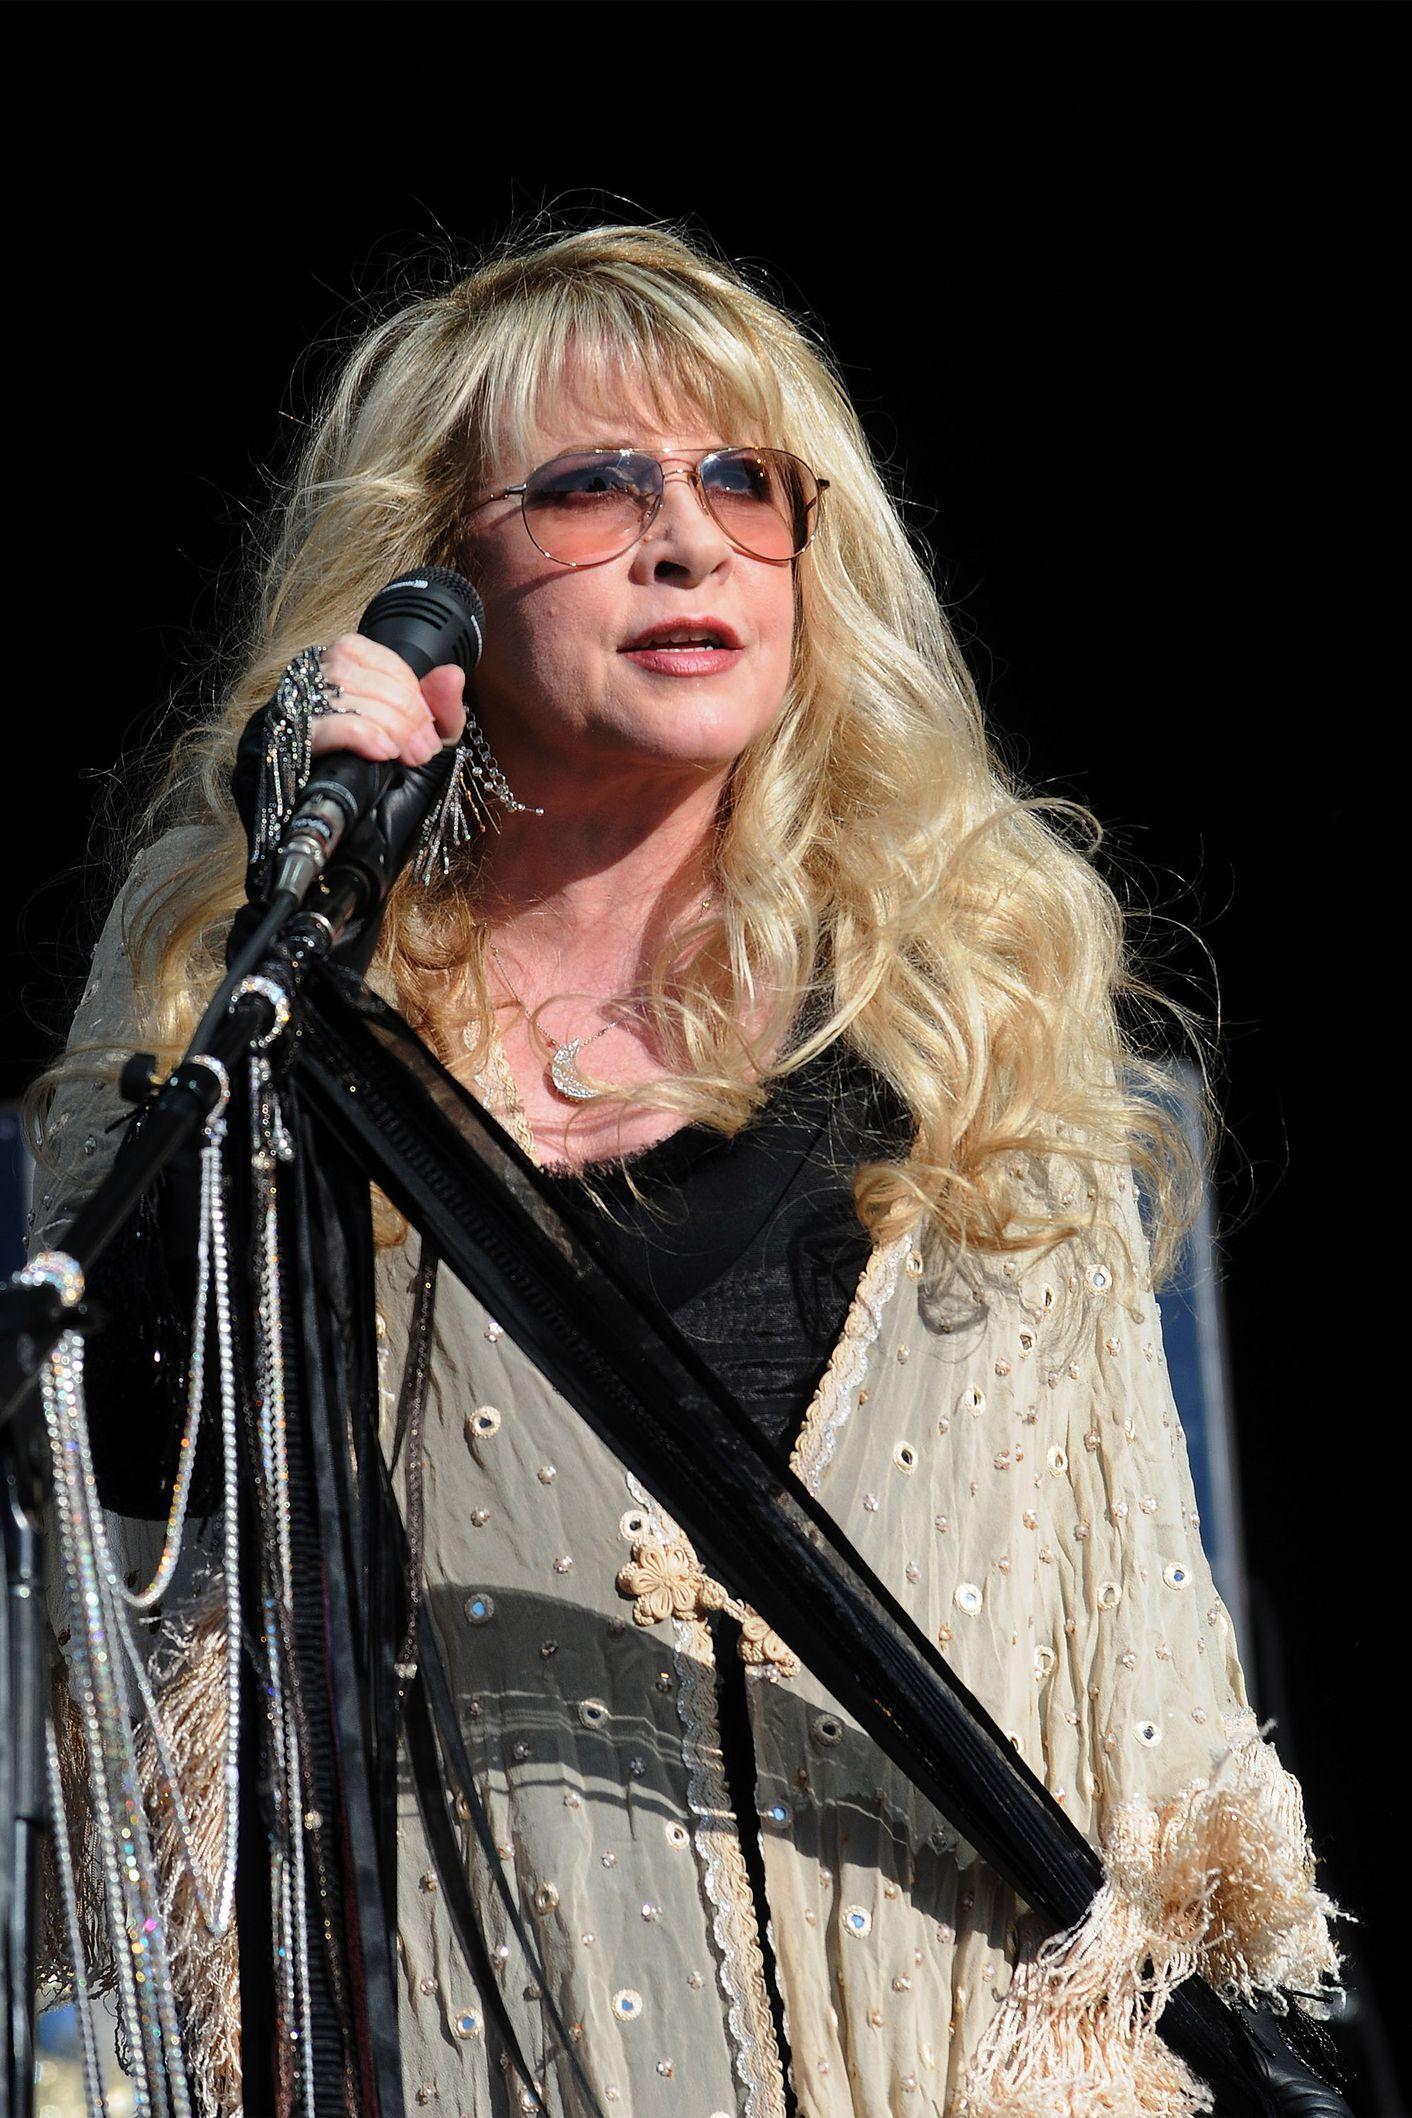 In Photos: Stevie Nicks' Iconic Style | Stevie | Stevie